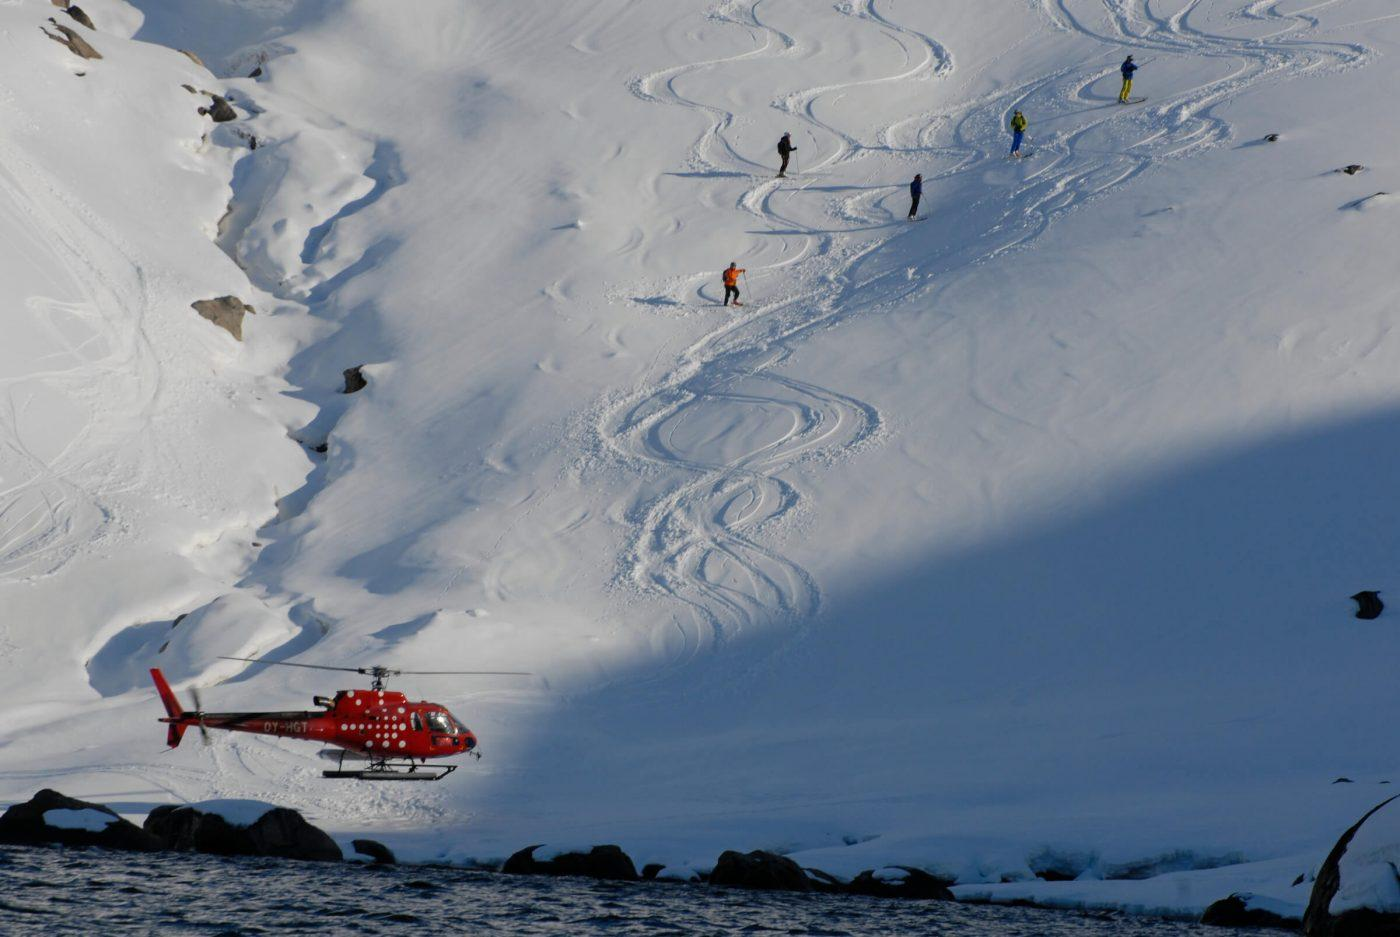 Heliskiing on Hamborgerland near Maniitsoq in Greenland. Photo by Jörg Ehrligh